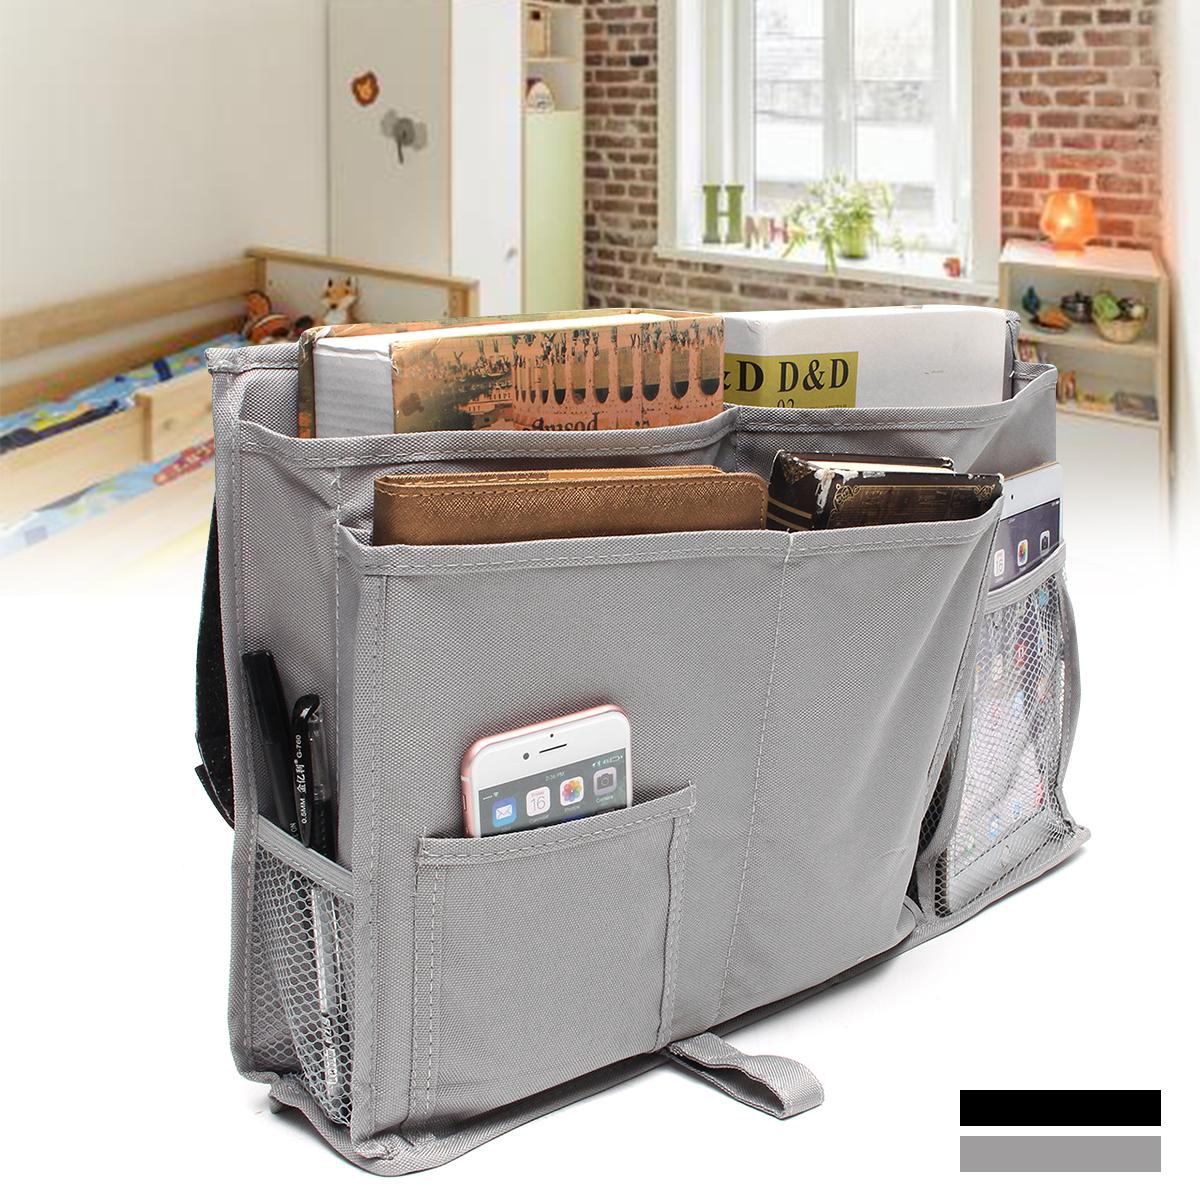 Grtsunsea 50x30cm/ 19.69x11.81'' Bedside Hanging Storage Pocket Organizer Holder Cabin Chair Shelf Bunk Baby Bed Storage Boxes